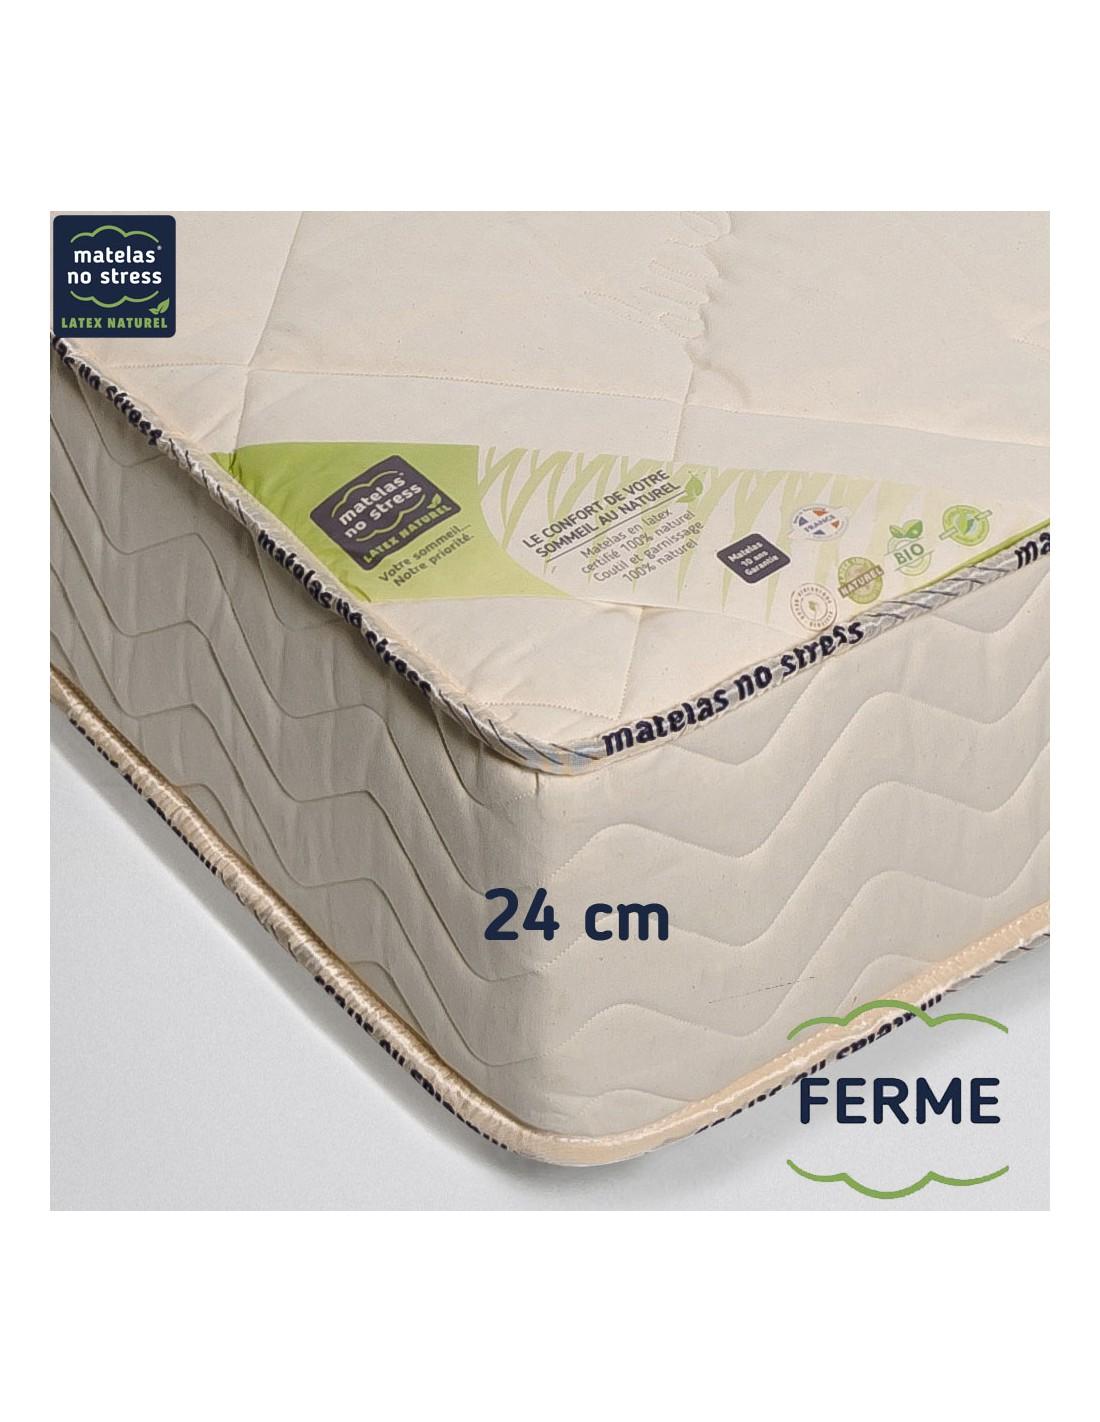 matelas latex bio naturel 90x190 prestige ferme 24 cm. Black Bedroom Furniture Sets. Home Design Ideas